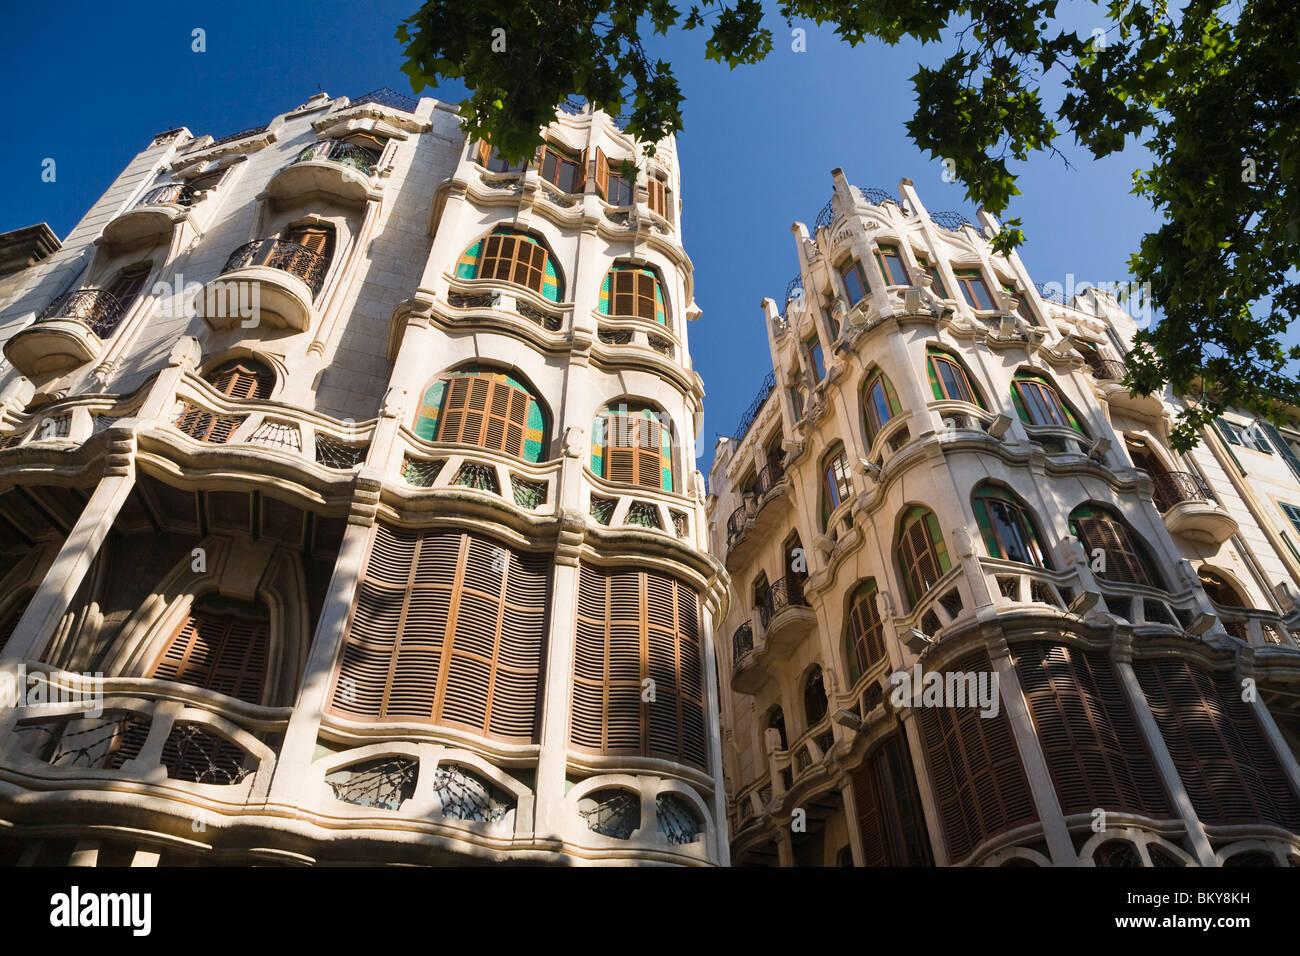 Facades of apartment houses in the sunlight, Placa del Mercat, Palma, Mallorca, Spain, Europe - Stock Image